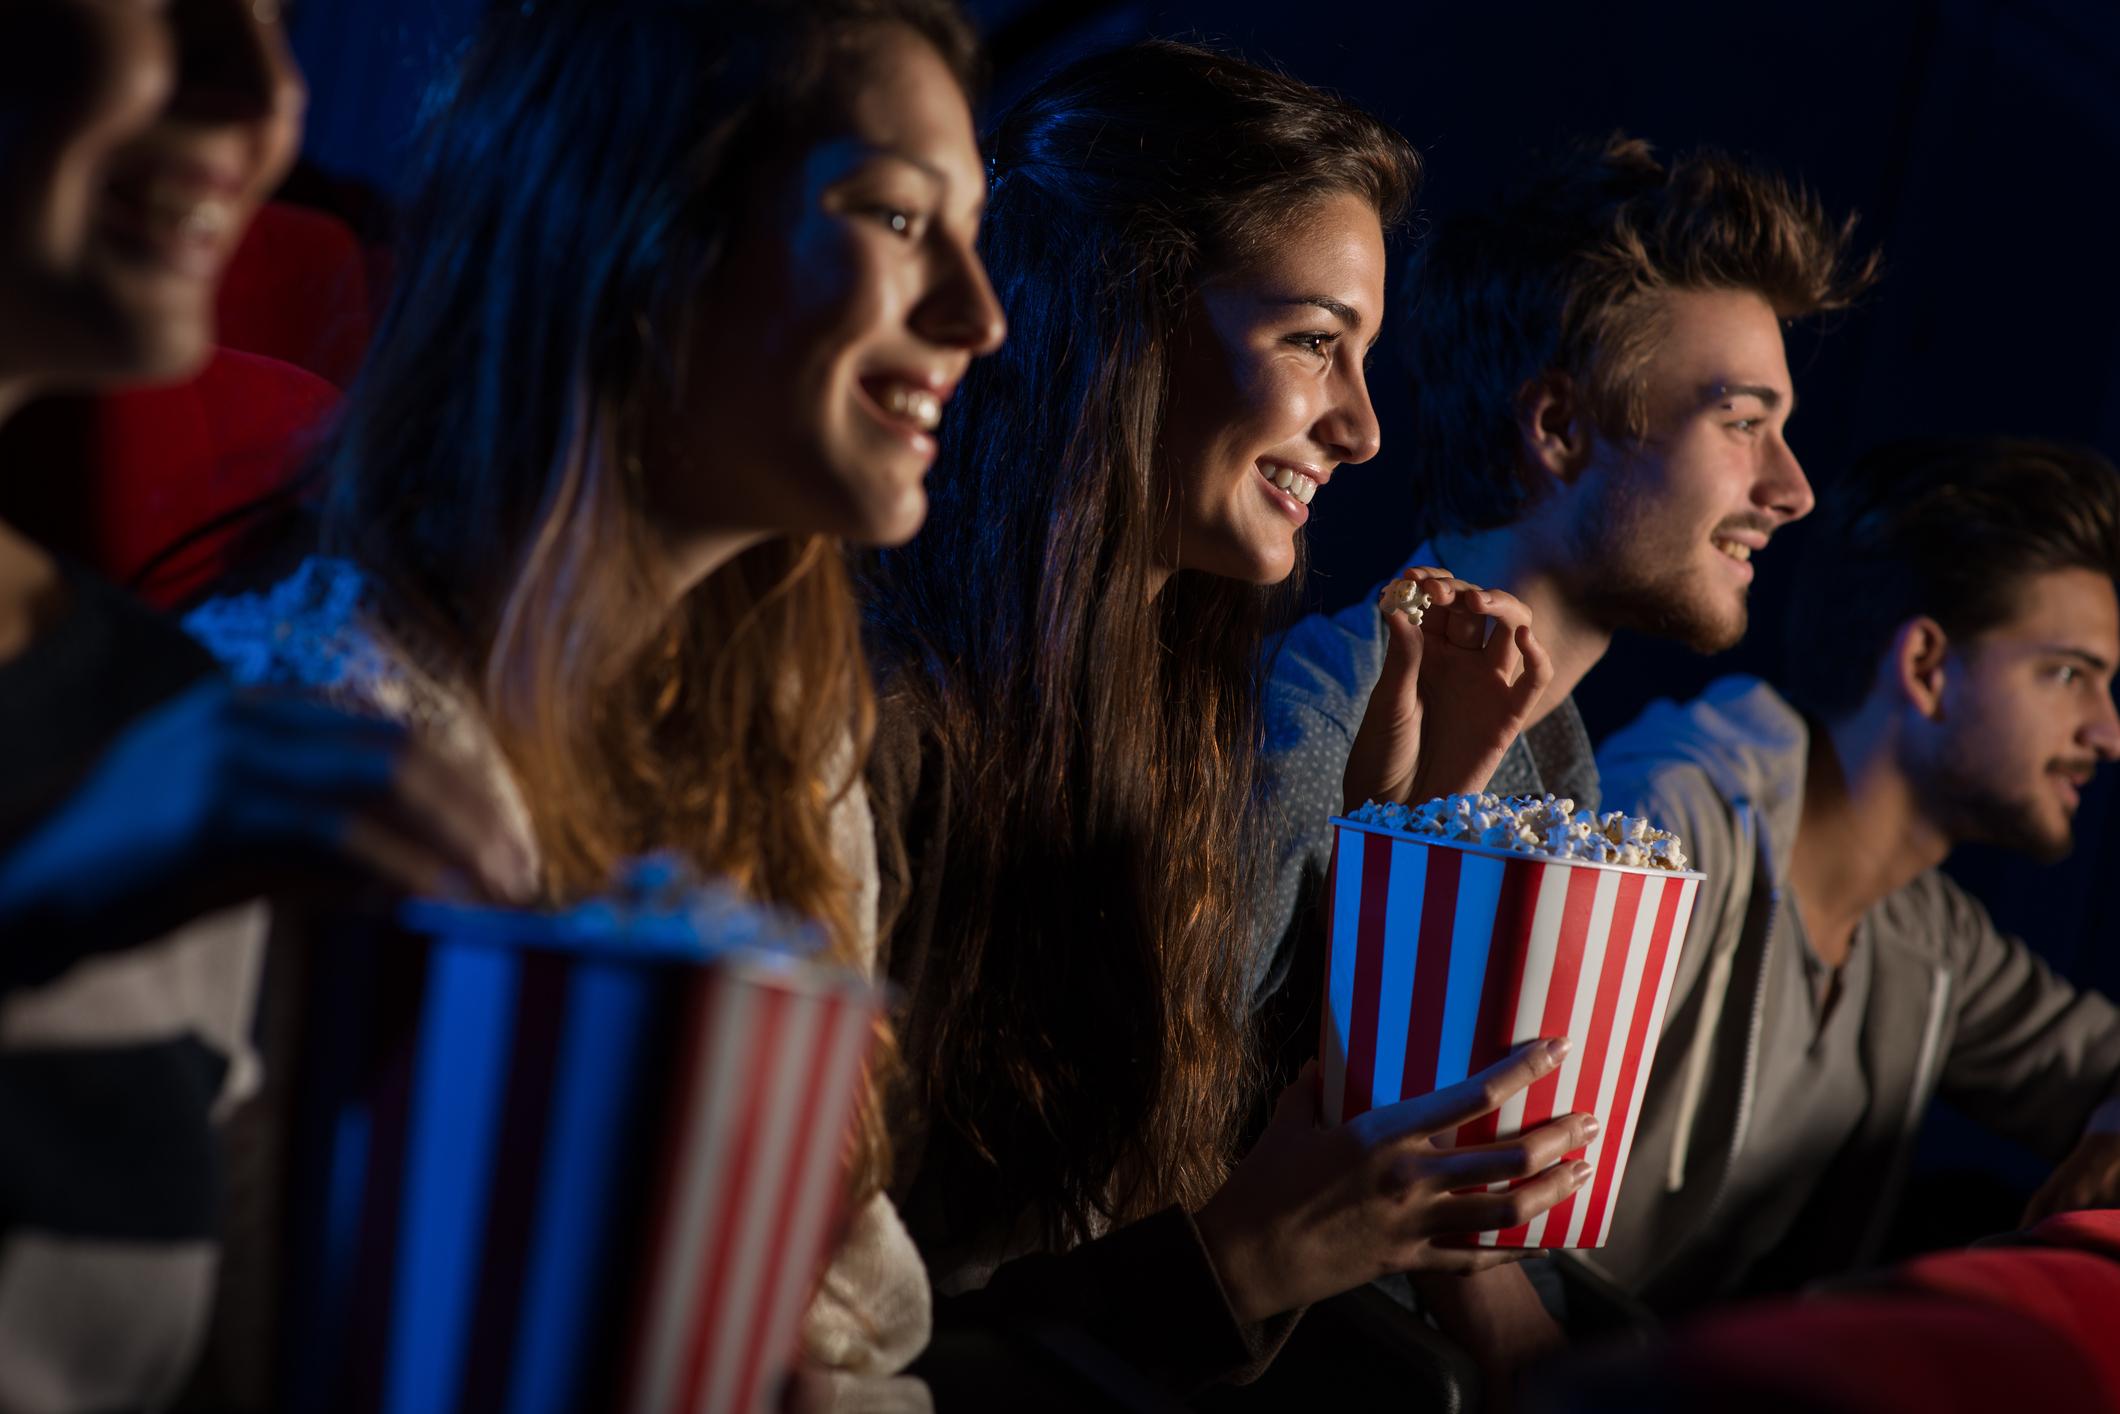 Moviegoers eating popcorn